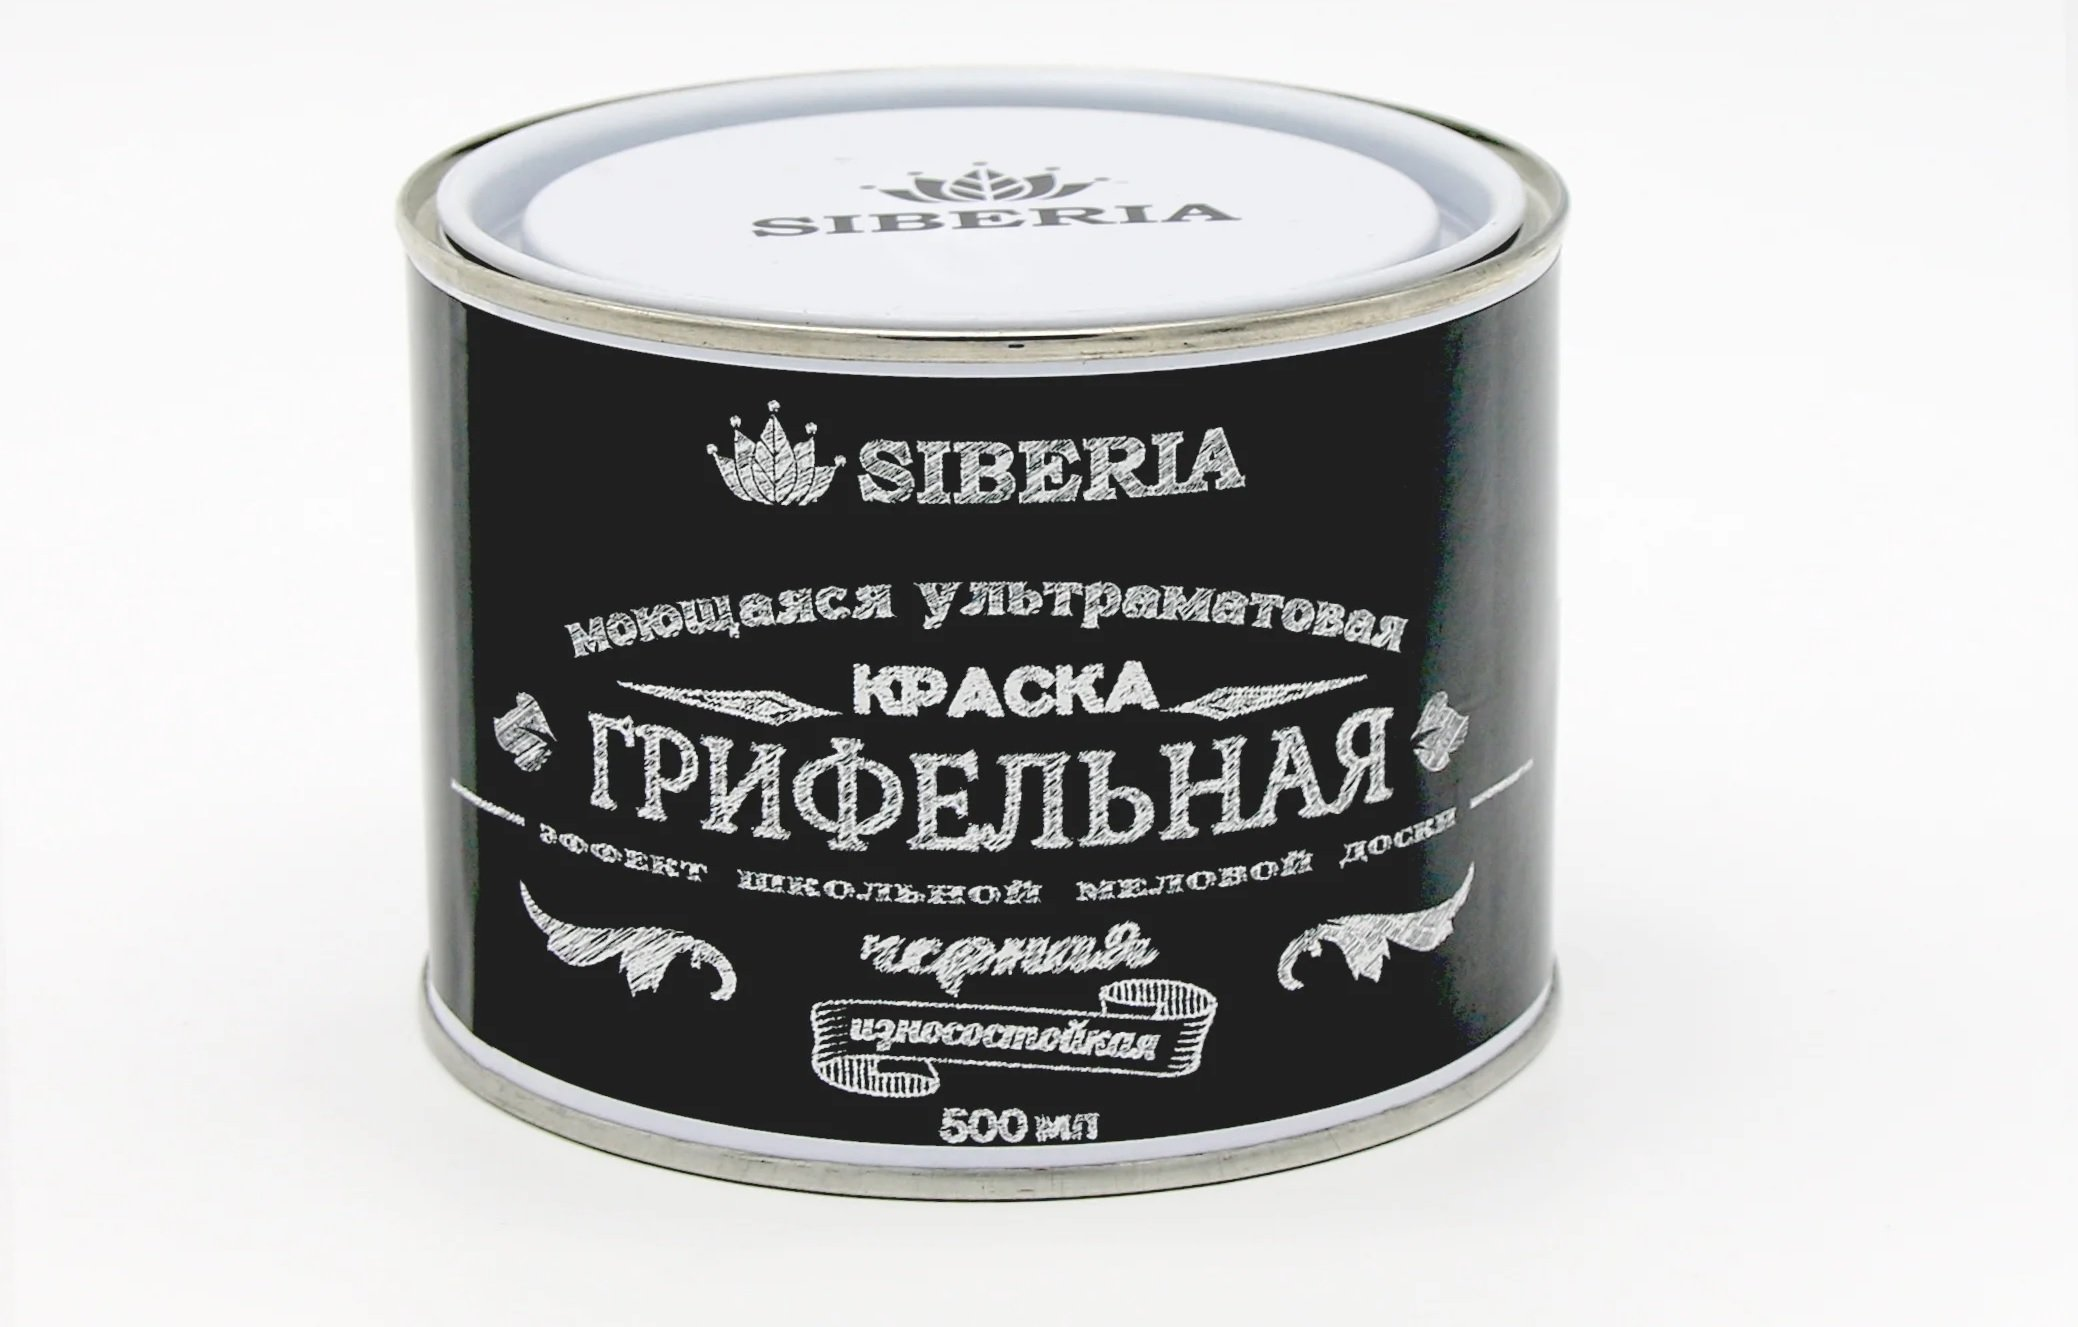 Грифельная краска Siberia